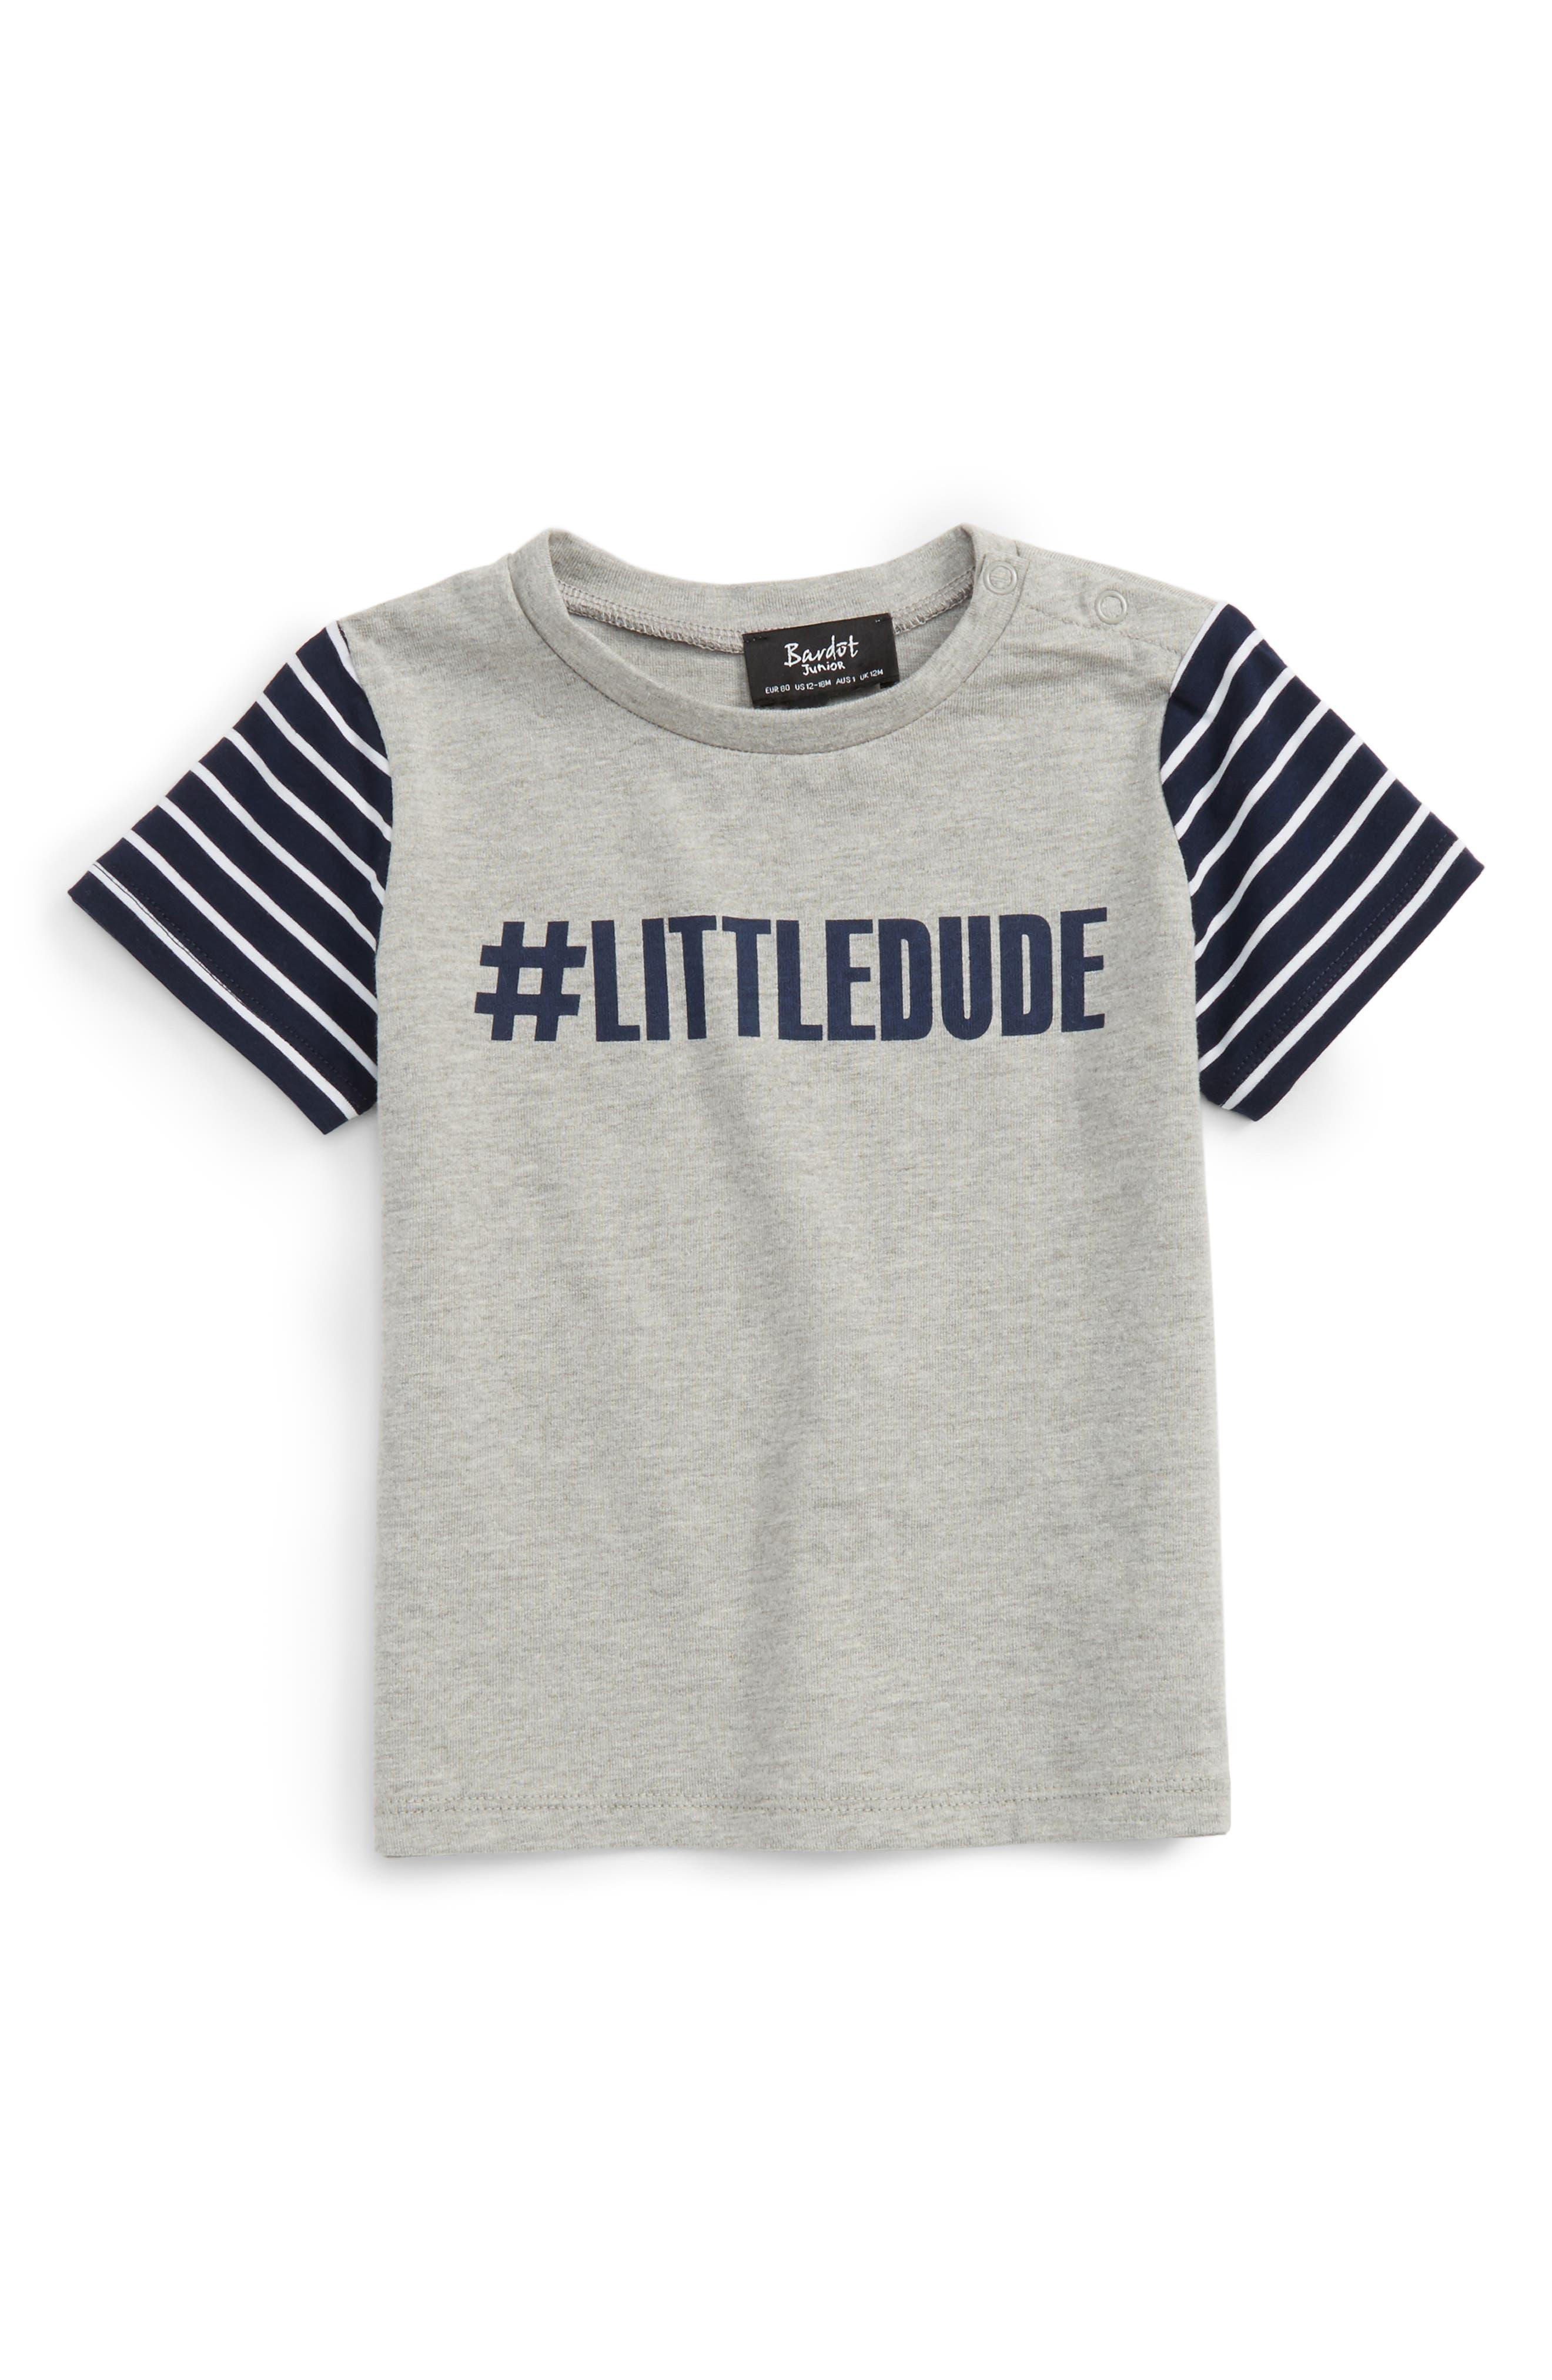 Main Image - Bardot Junior LittleDude T-Shirt (Baby Boys)